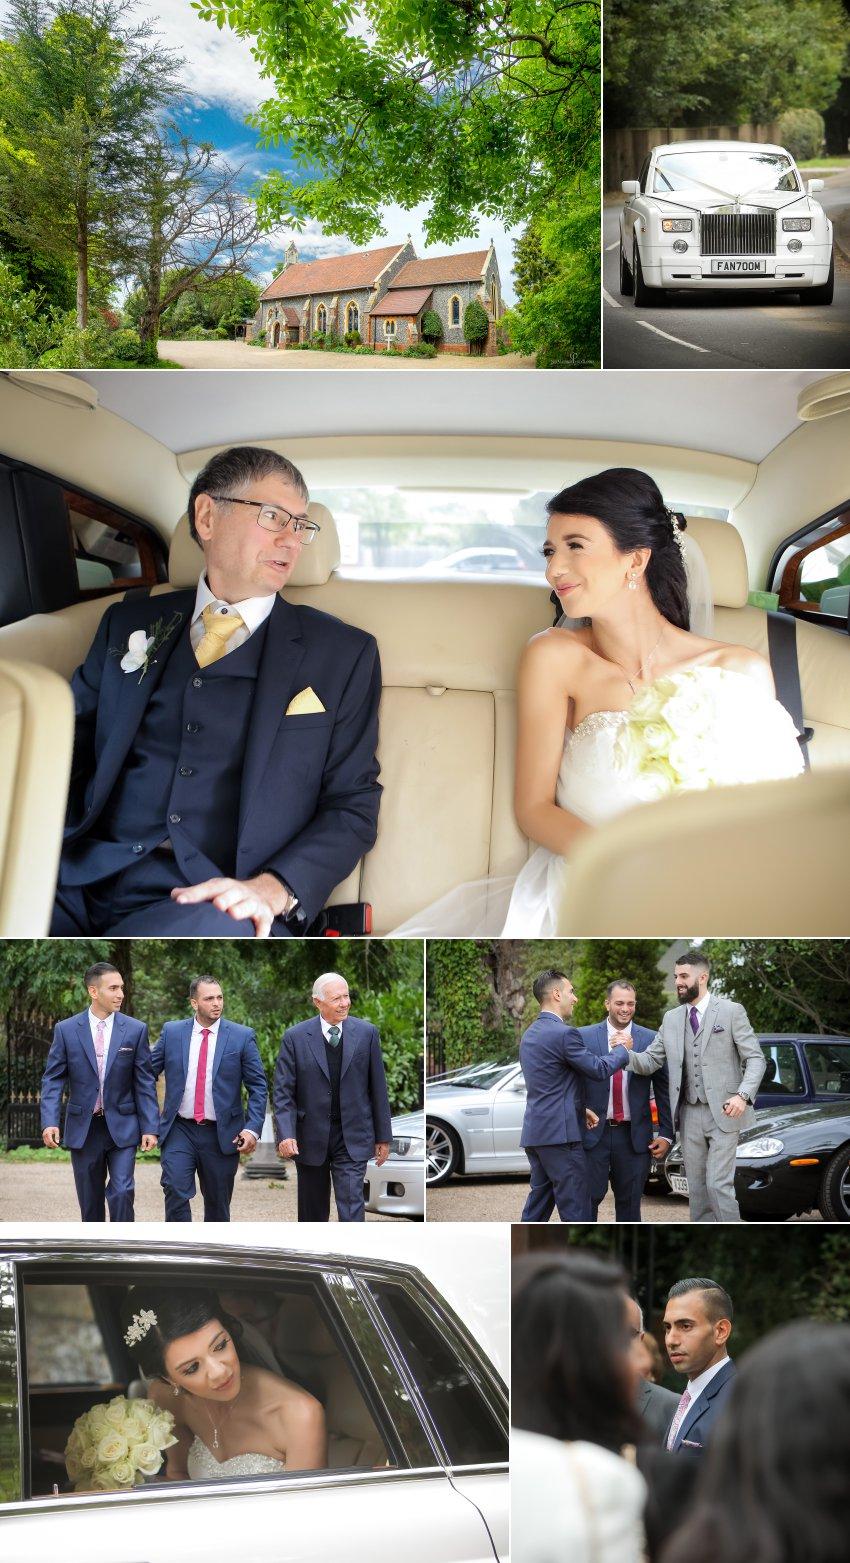 A wedding at 12 Apostles Greek church 09